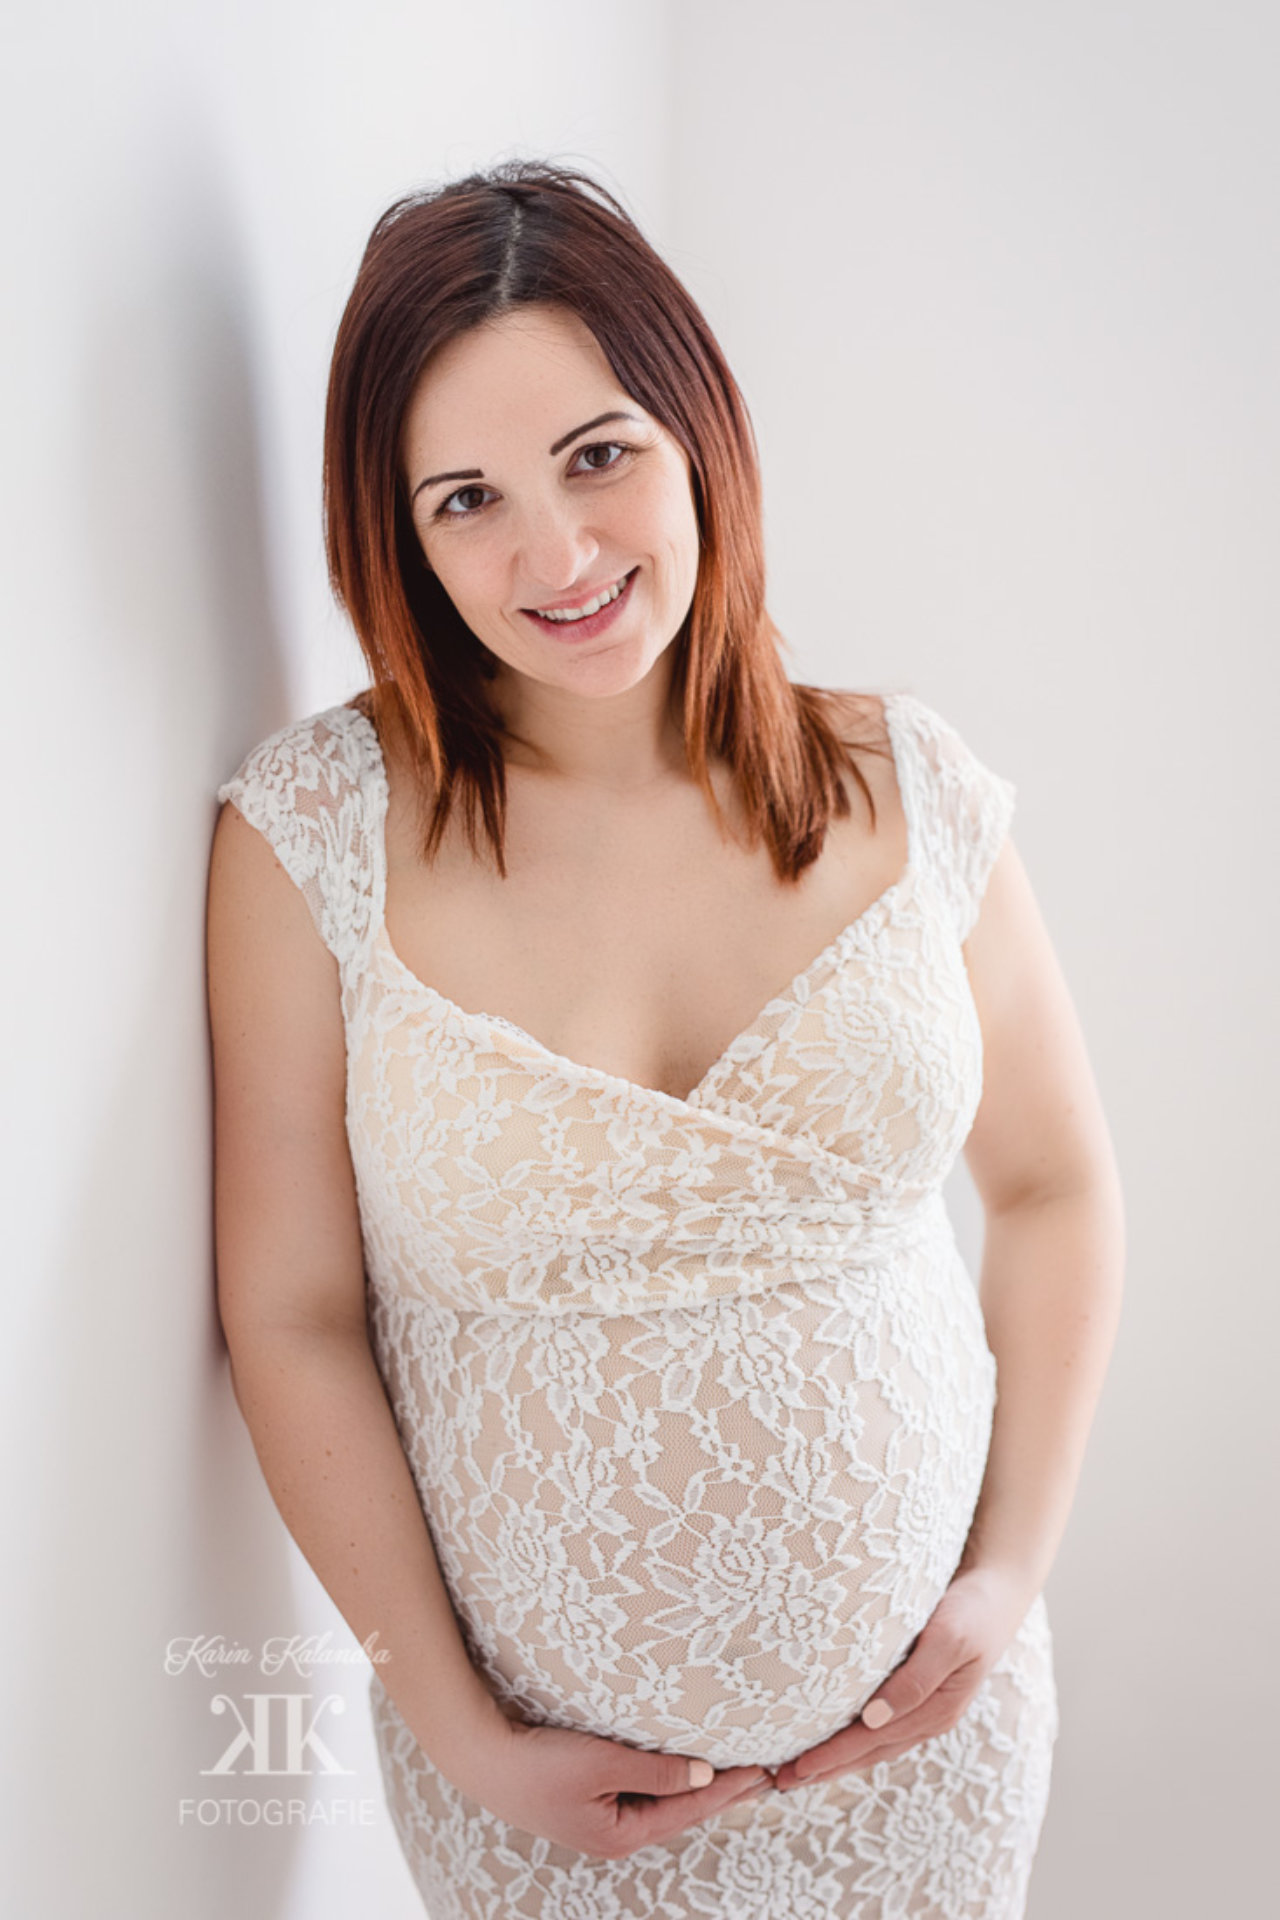 Schwangerschafts-Fotoshooting #7